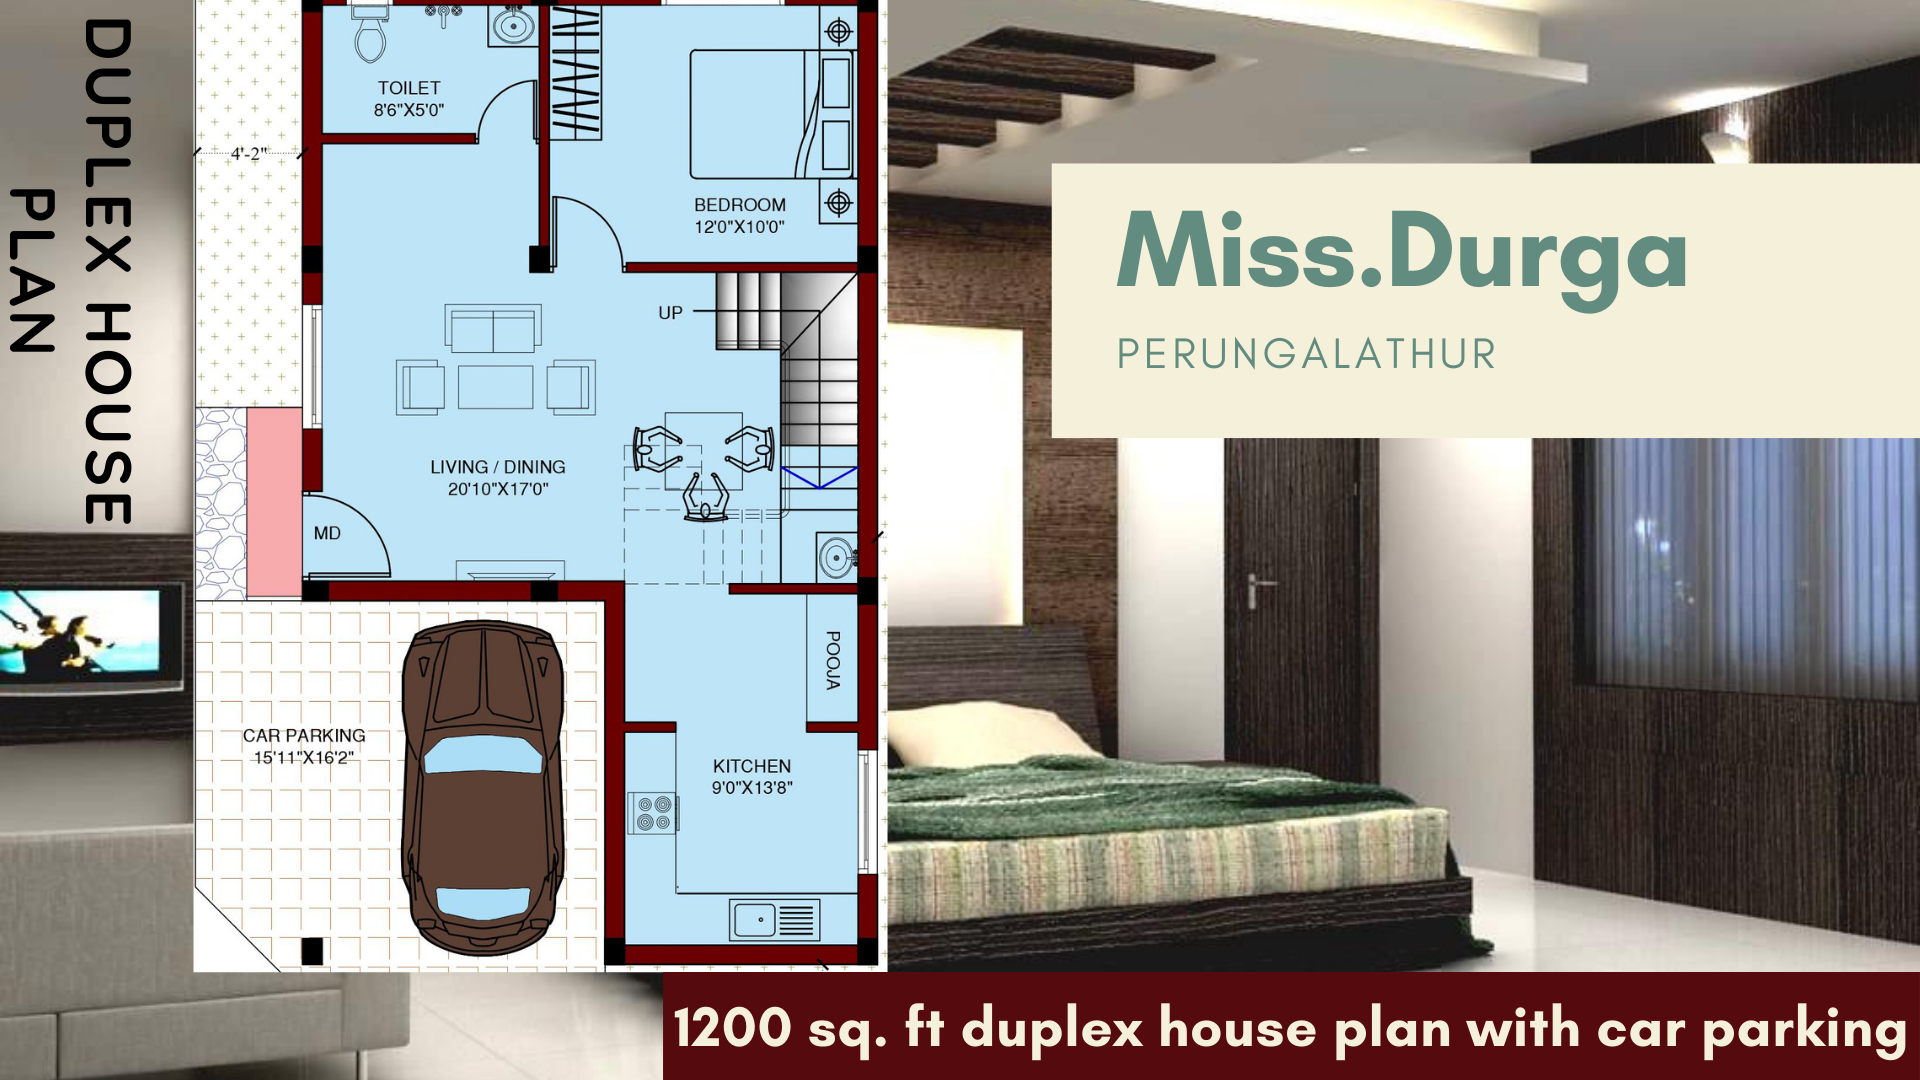 duplex house plan 1200 sq.ft